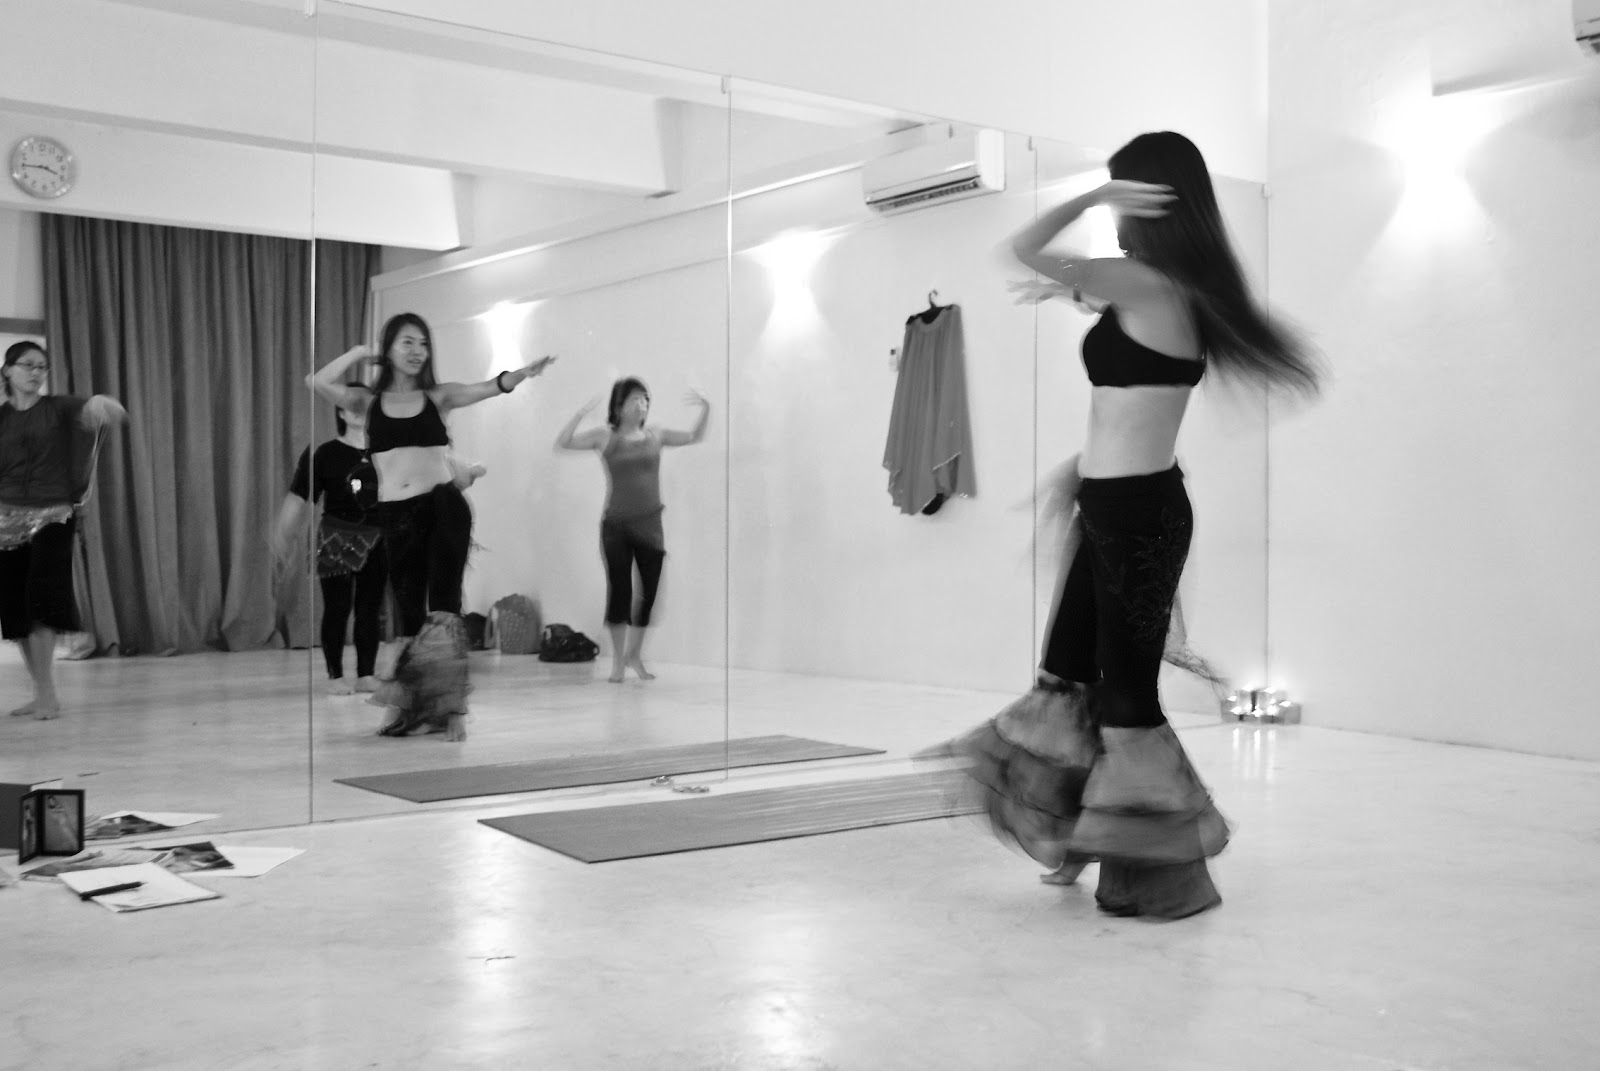 Dance Classes at WasabiYogaStudio Aug' 2010